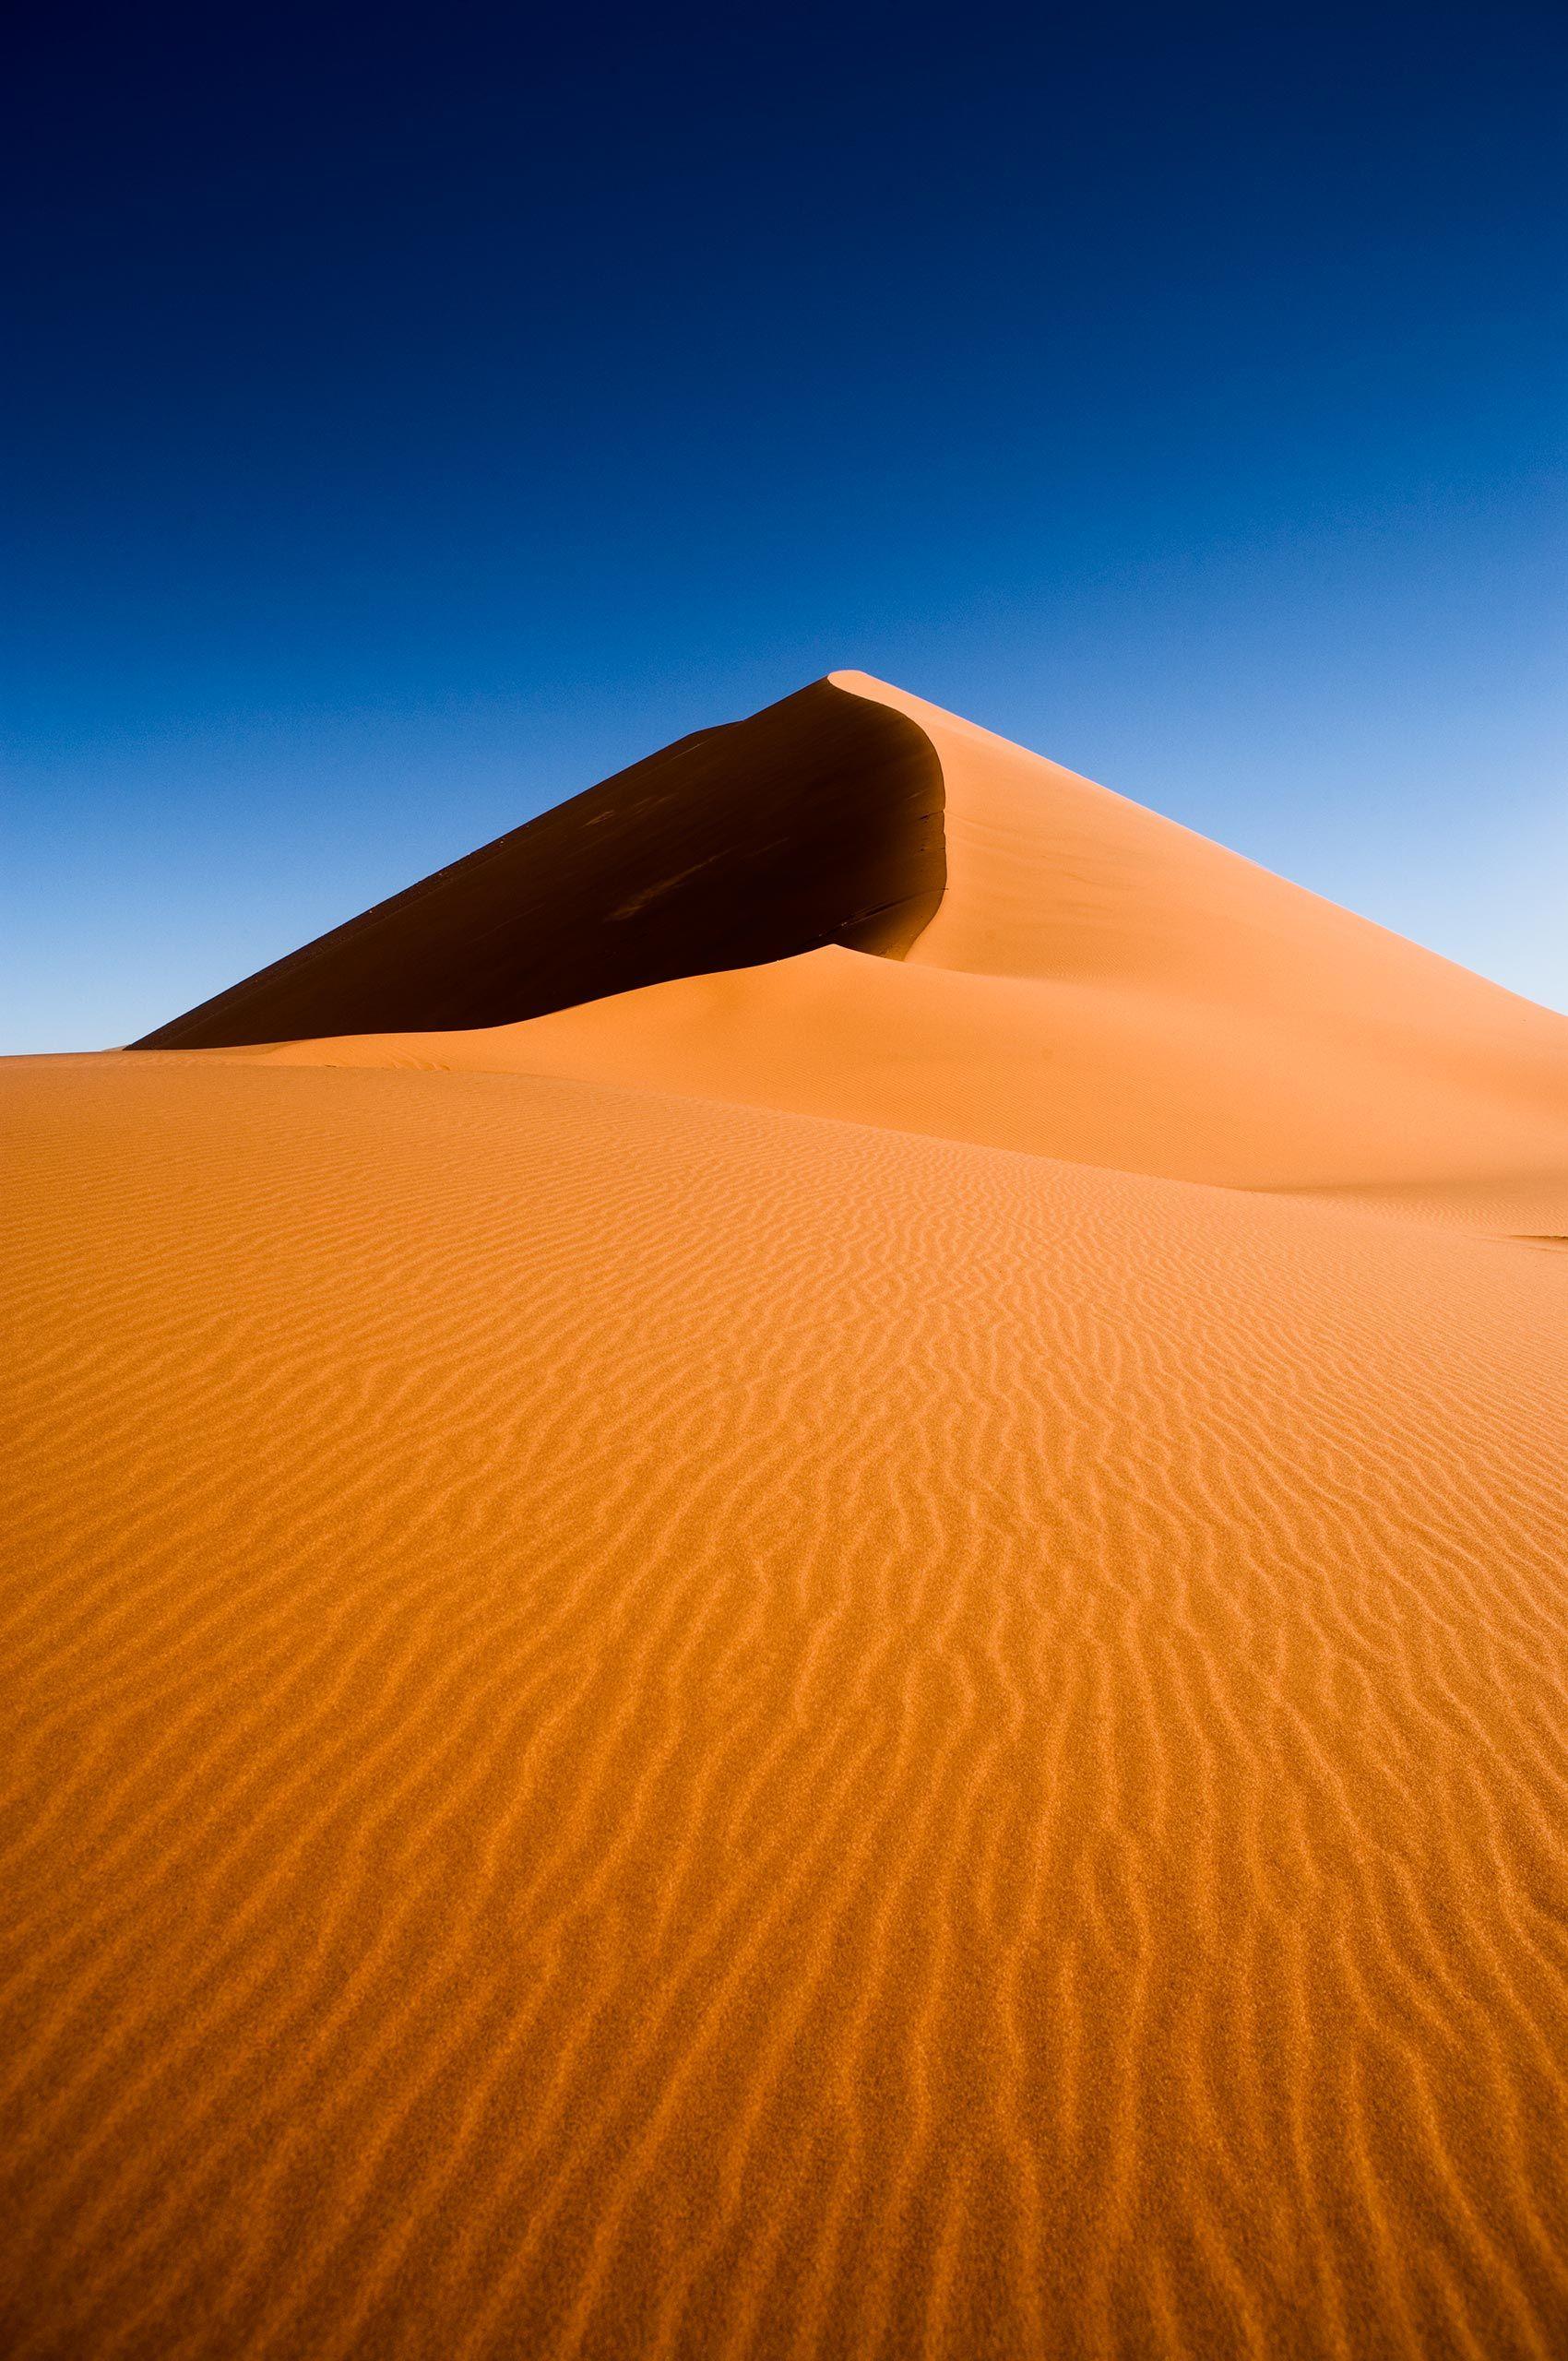 sossusvlei-sanddune-namibia-HenrikOlundPhotography.jpg